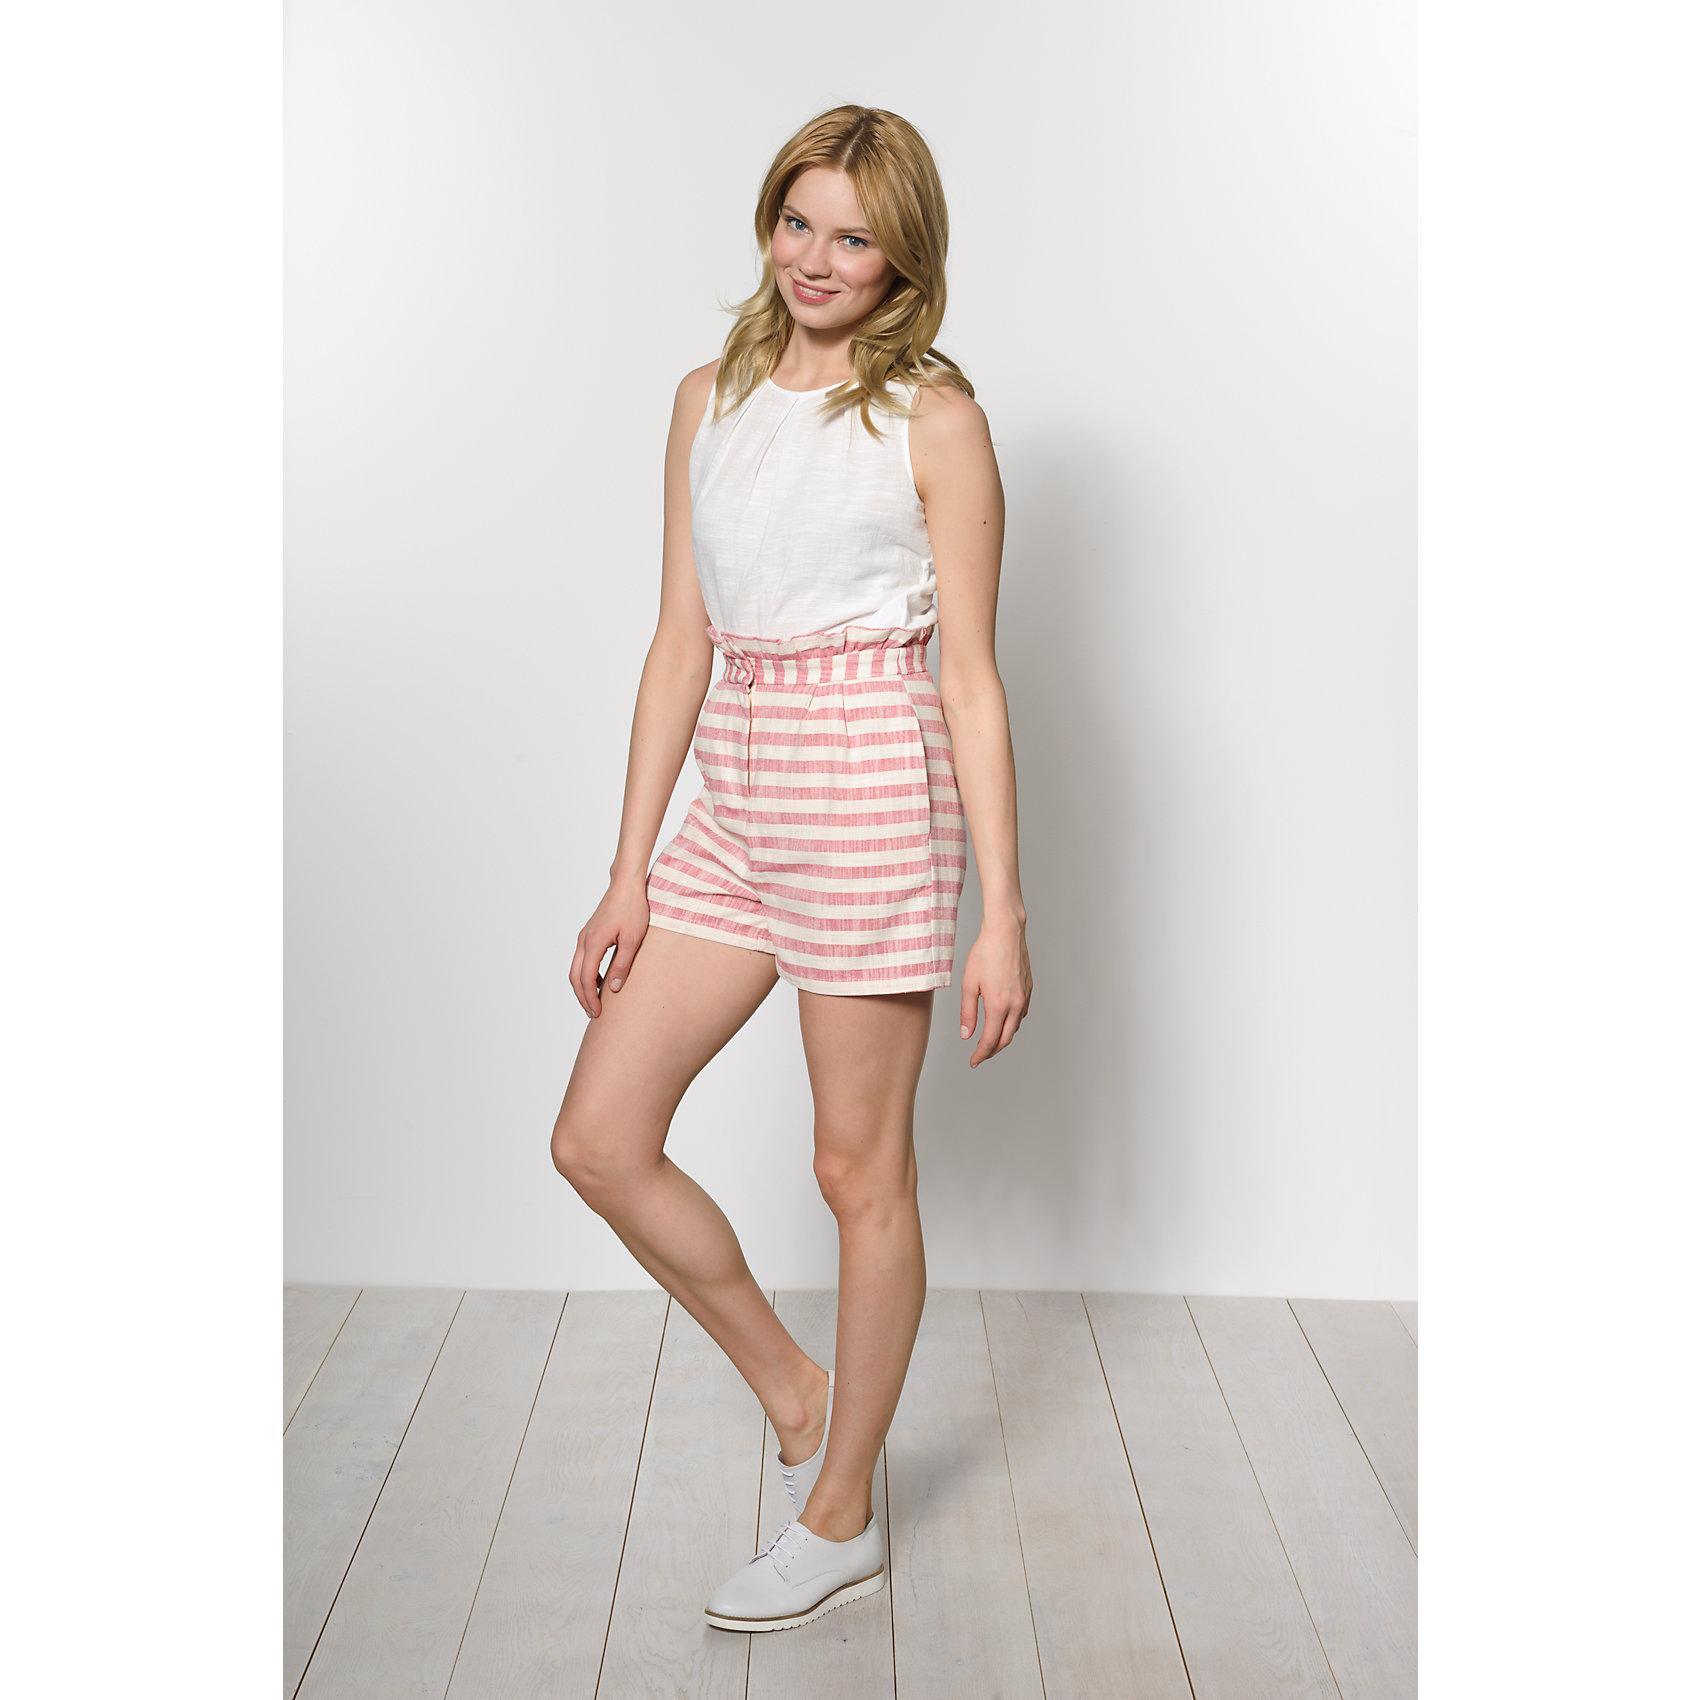 Neu VERO MODA Shorts 5639418 für Damen beige rot beige blau   eBay 437b0b263f